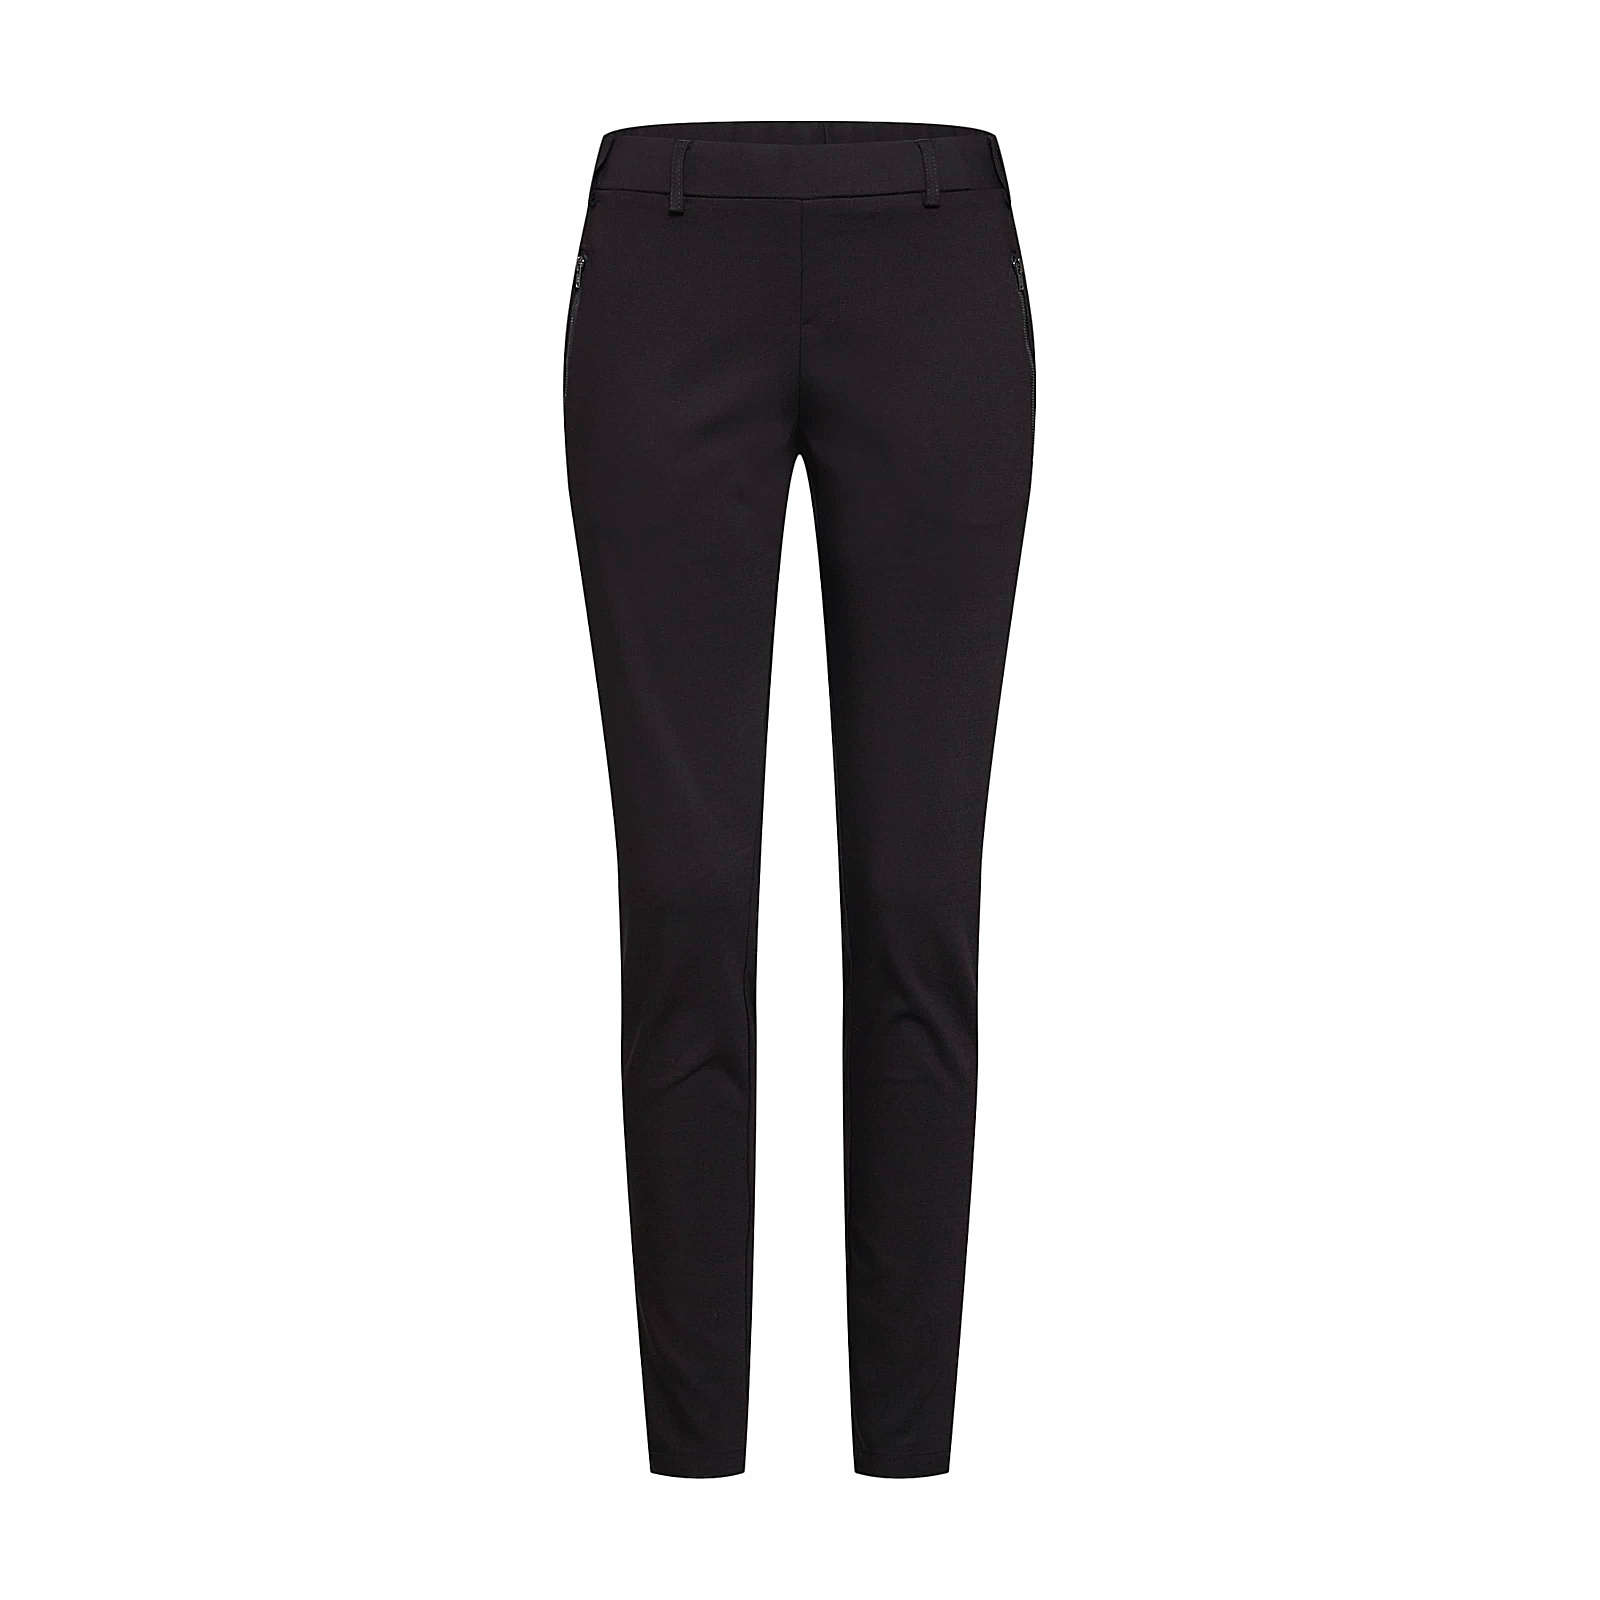 Kaffe Bügelfaltenhose Vera Pants Anzughosen schwarz Damen Gr. 40